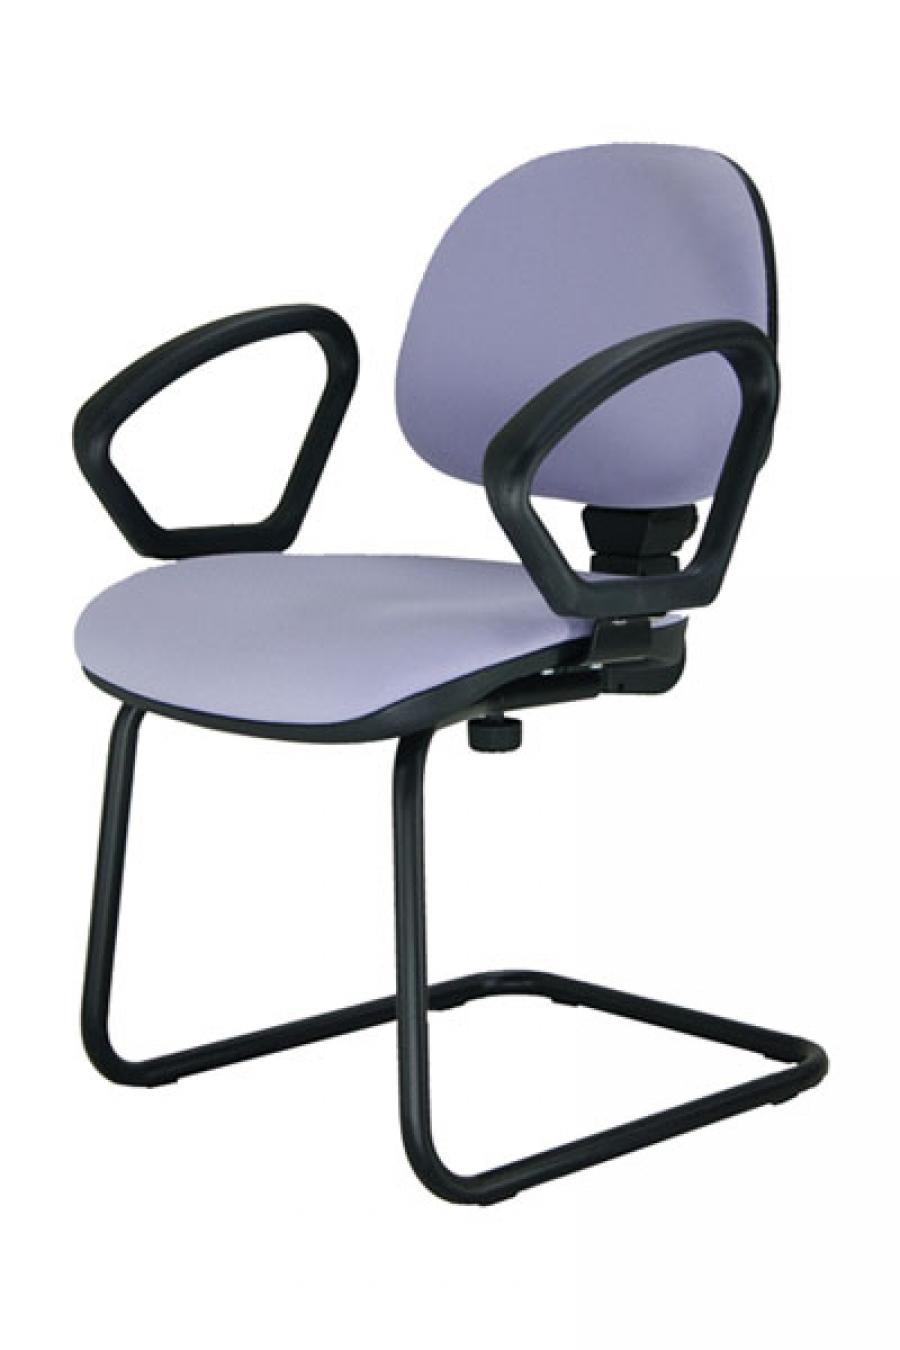 Sillas de escritorio baratas for Sillas de oficina baratas